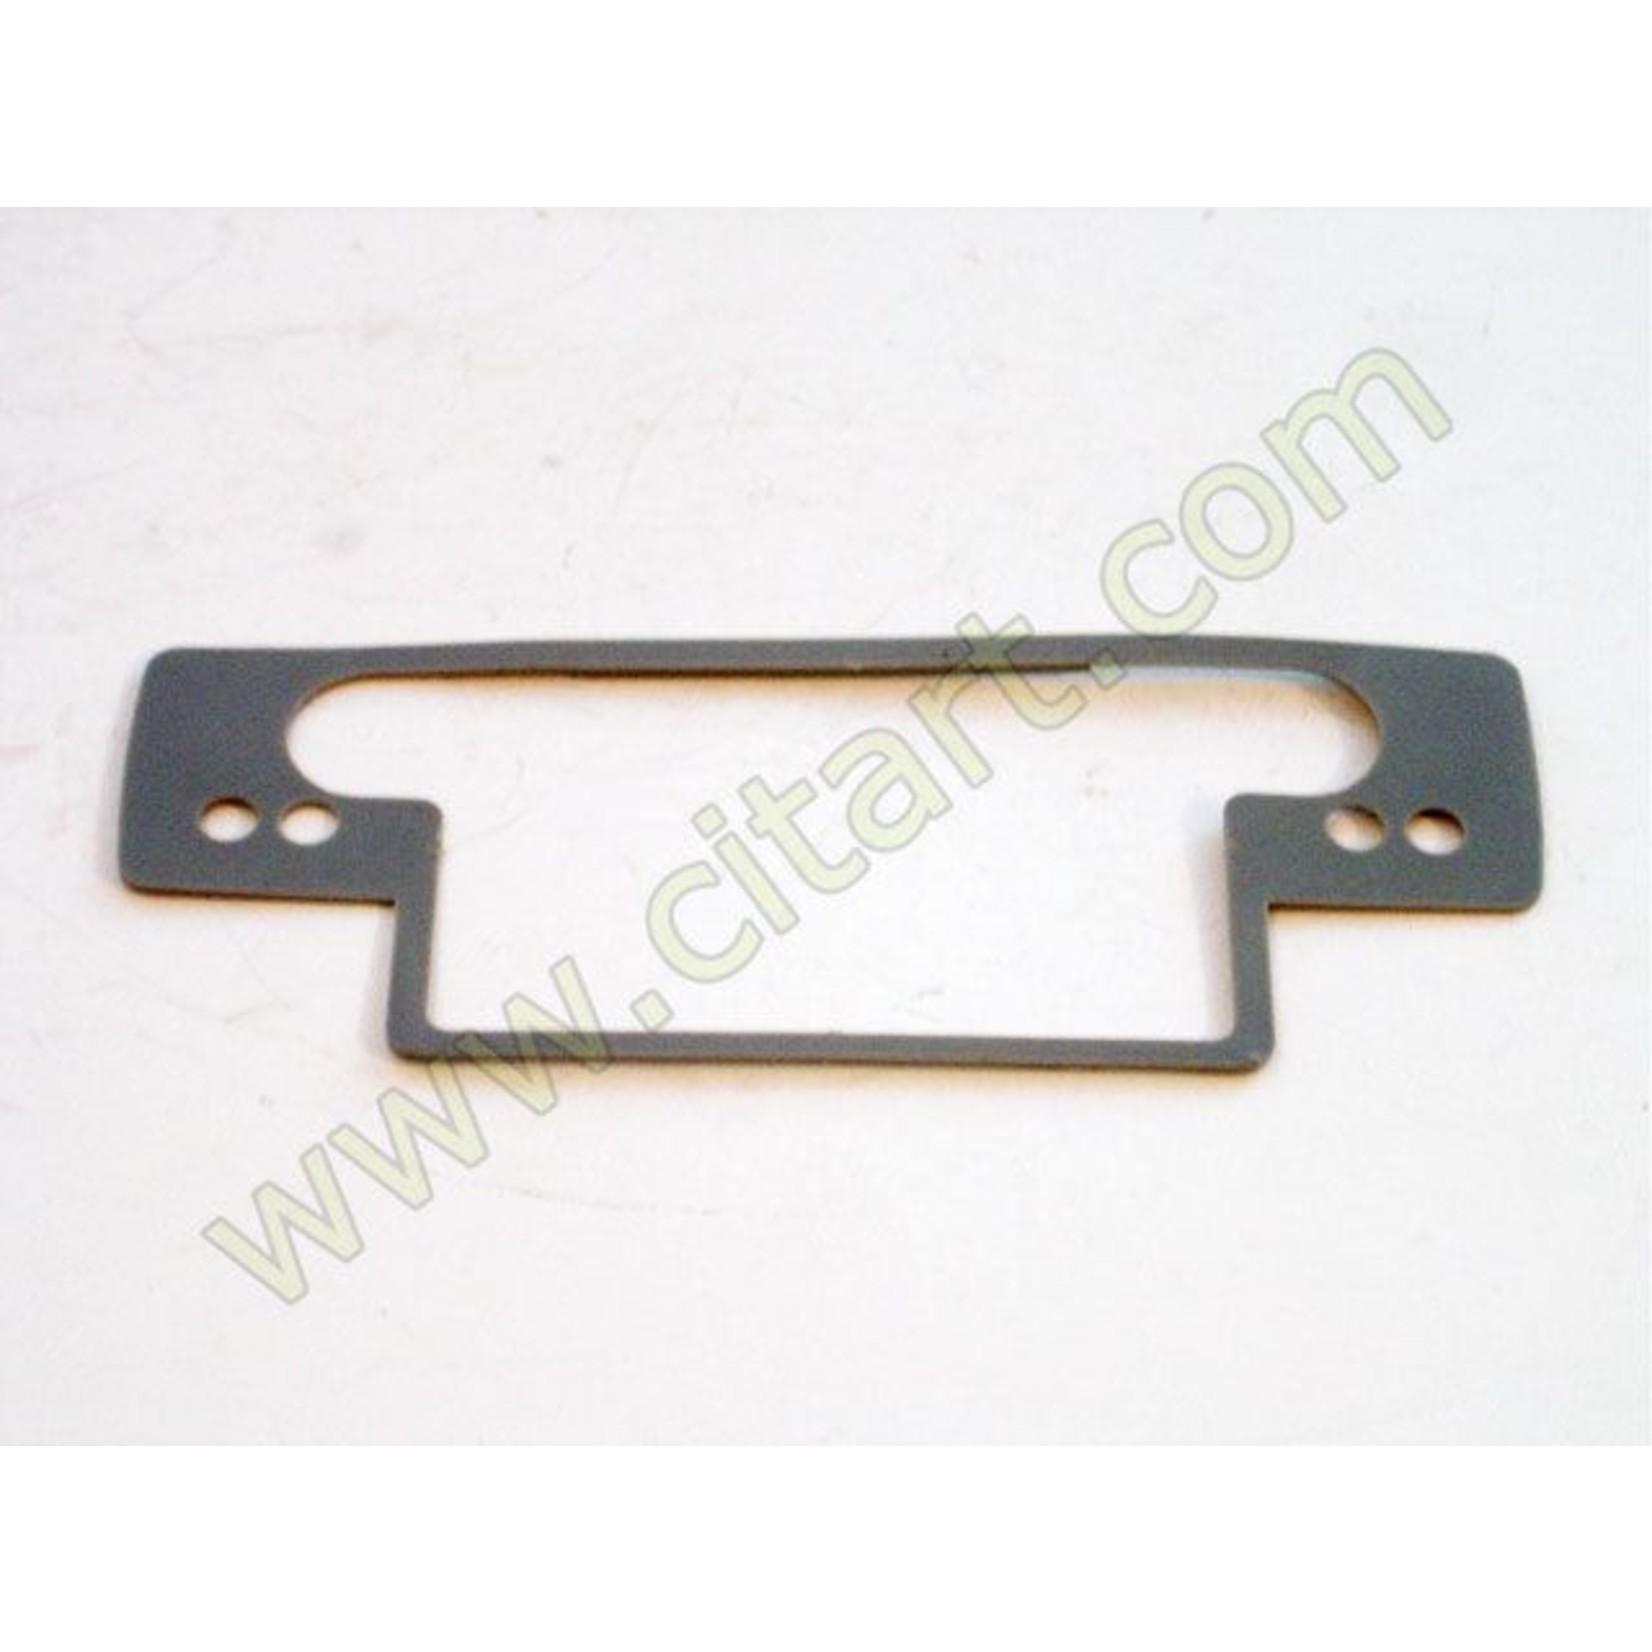 Base piece under handle 72- Nr Org: 5404108